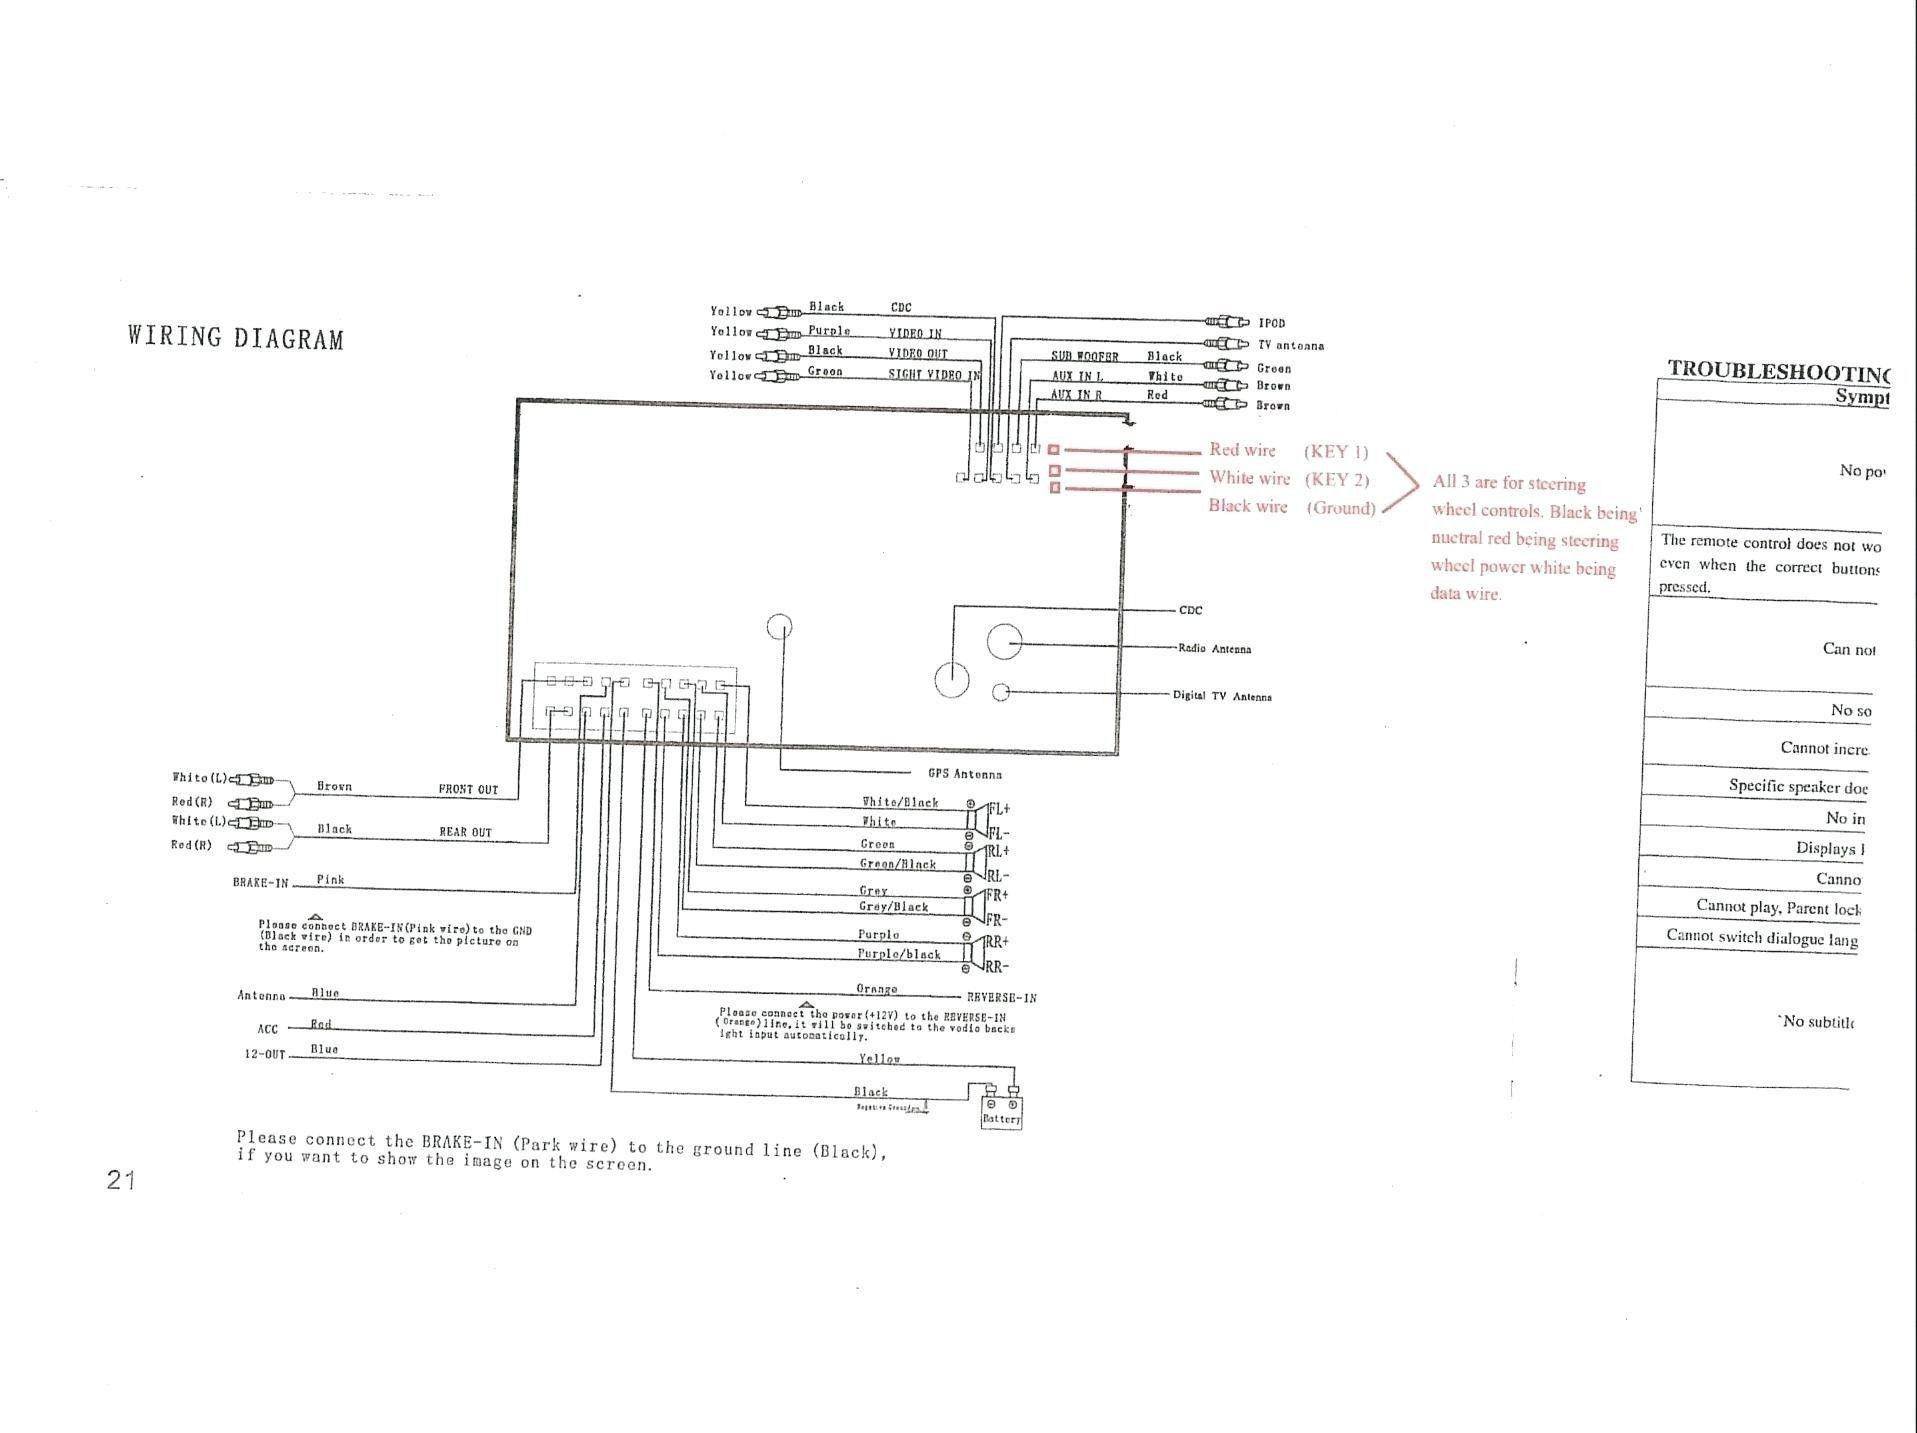 Inspirational Axxess Gmos 04 Wiring Diagram In 2020 Wire Gmos Diagram